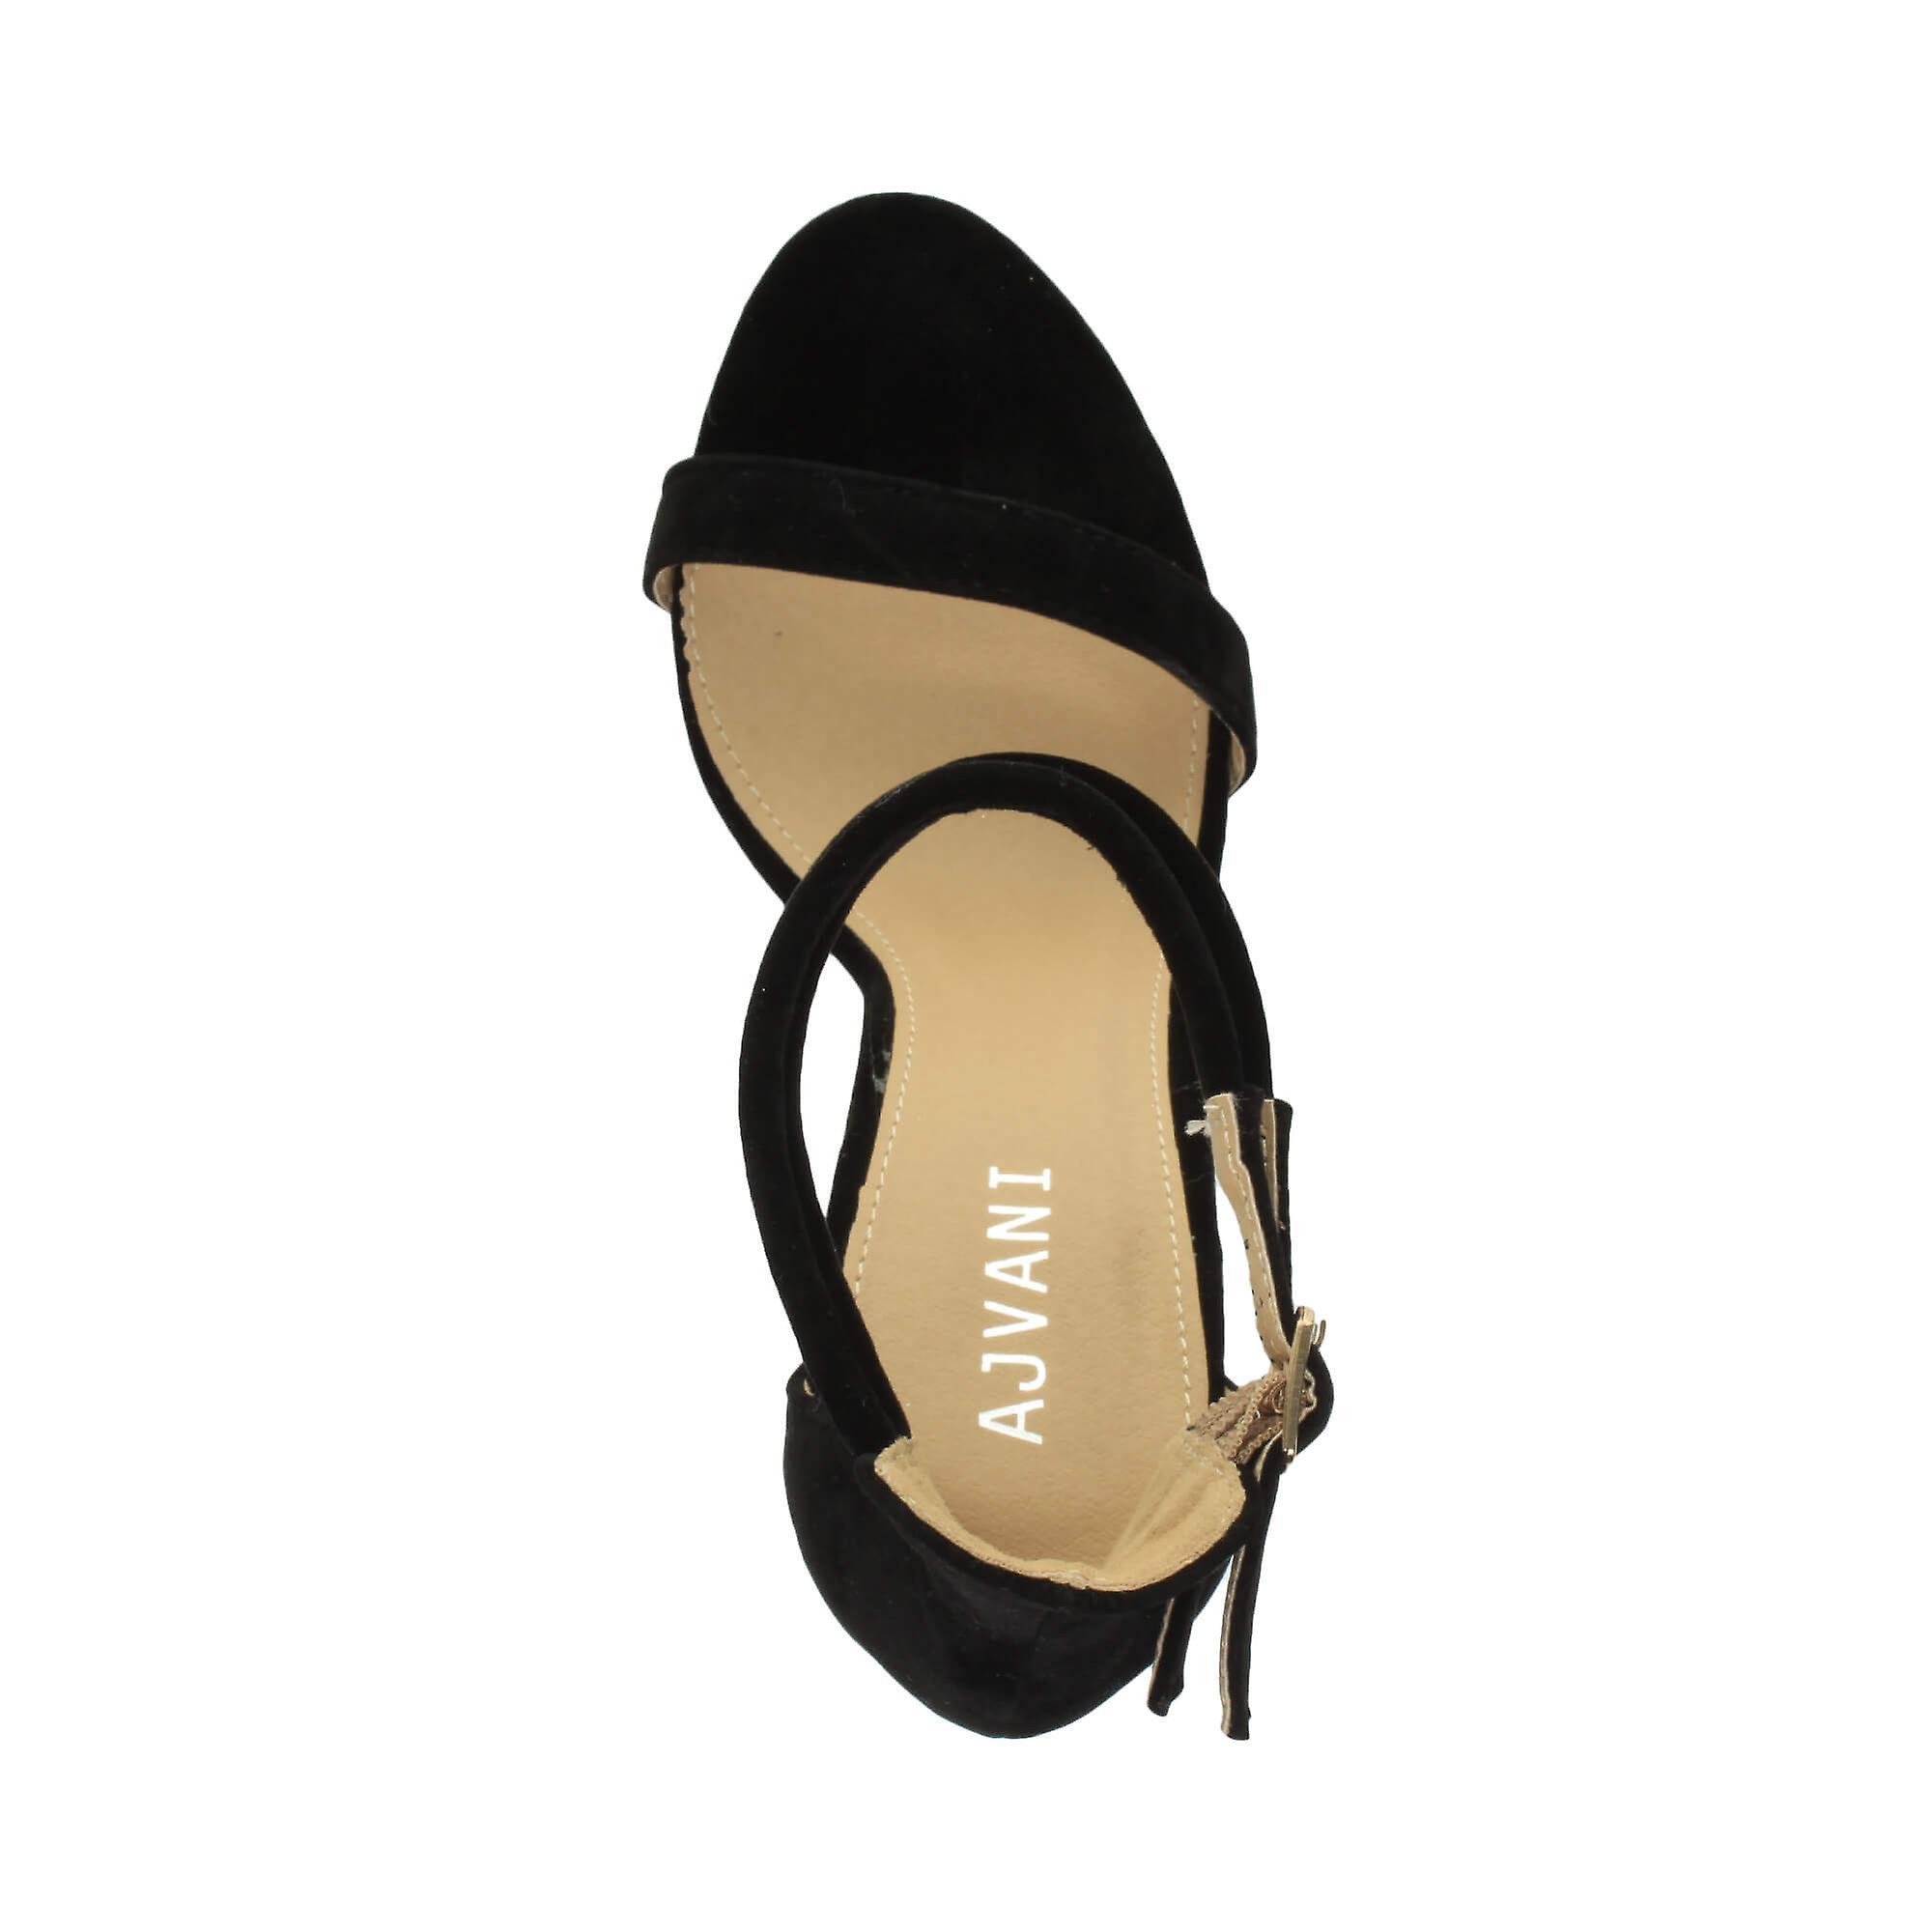 c2aa2921b08 Ajvani womens hög stilettklack knappt det dubbel rem spänne fest sandaler  skor